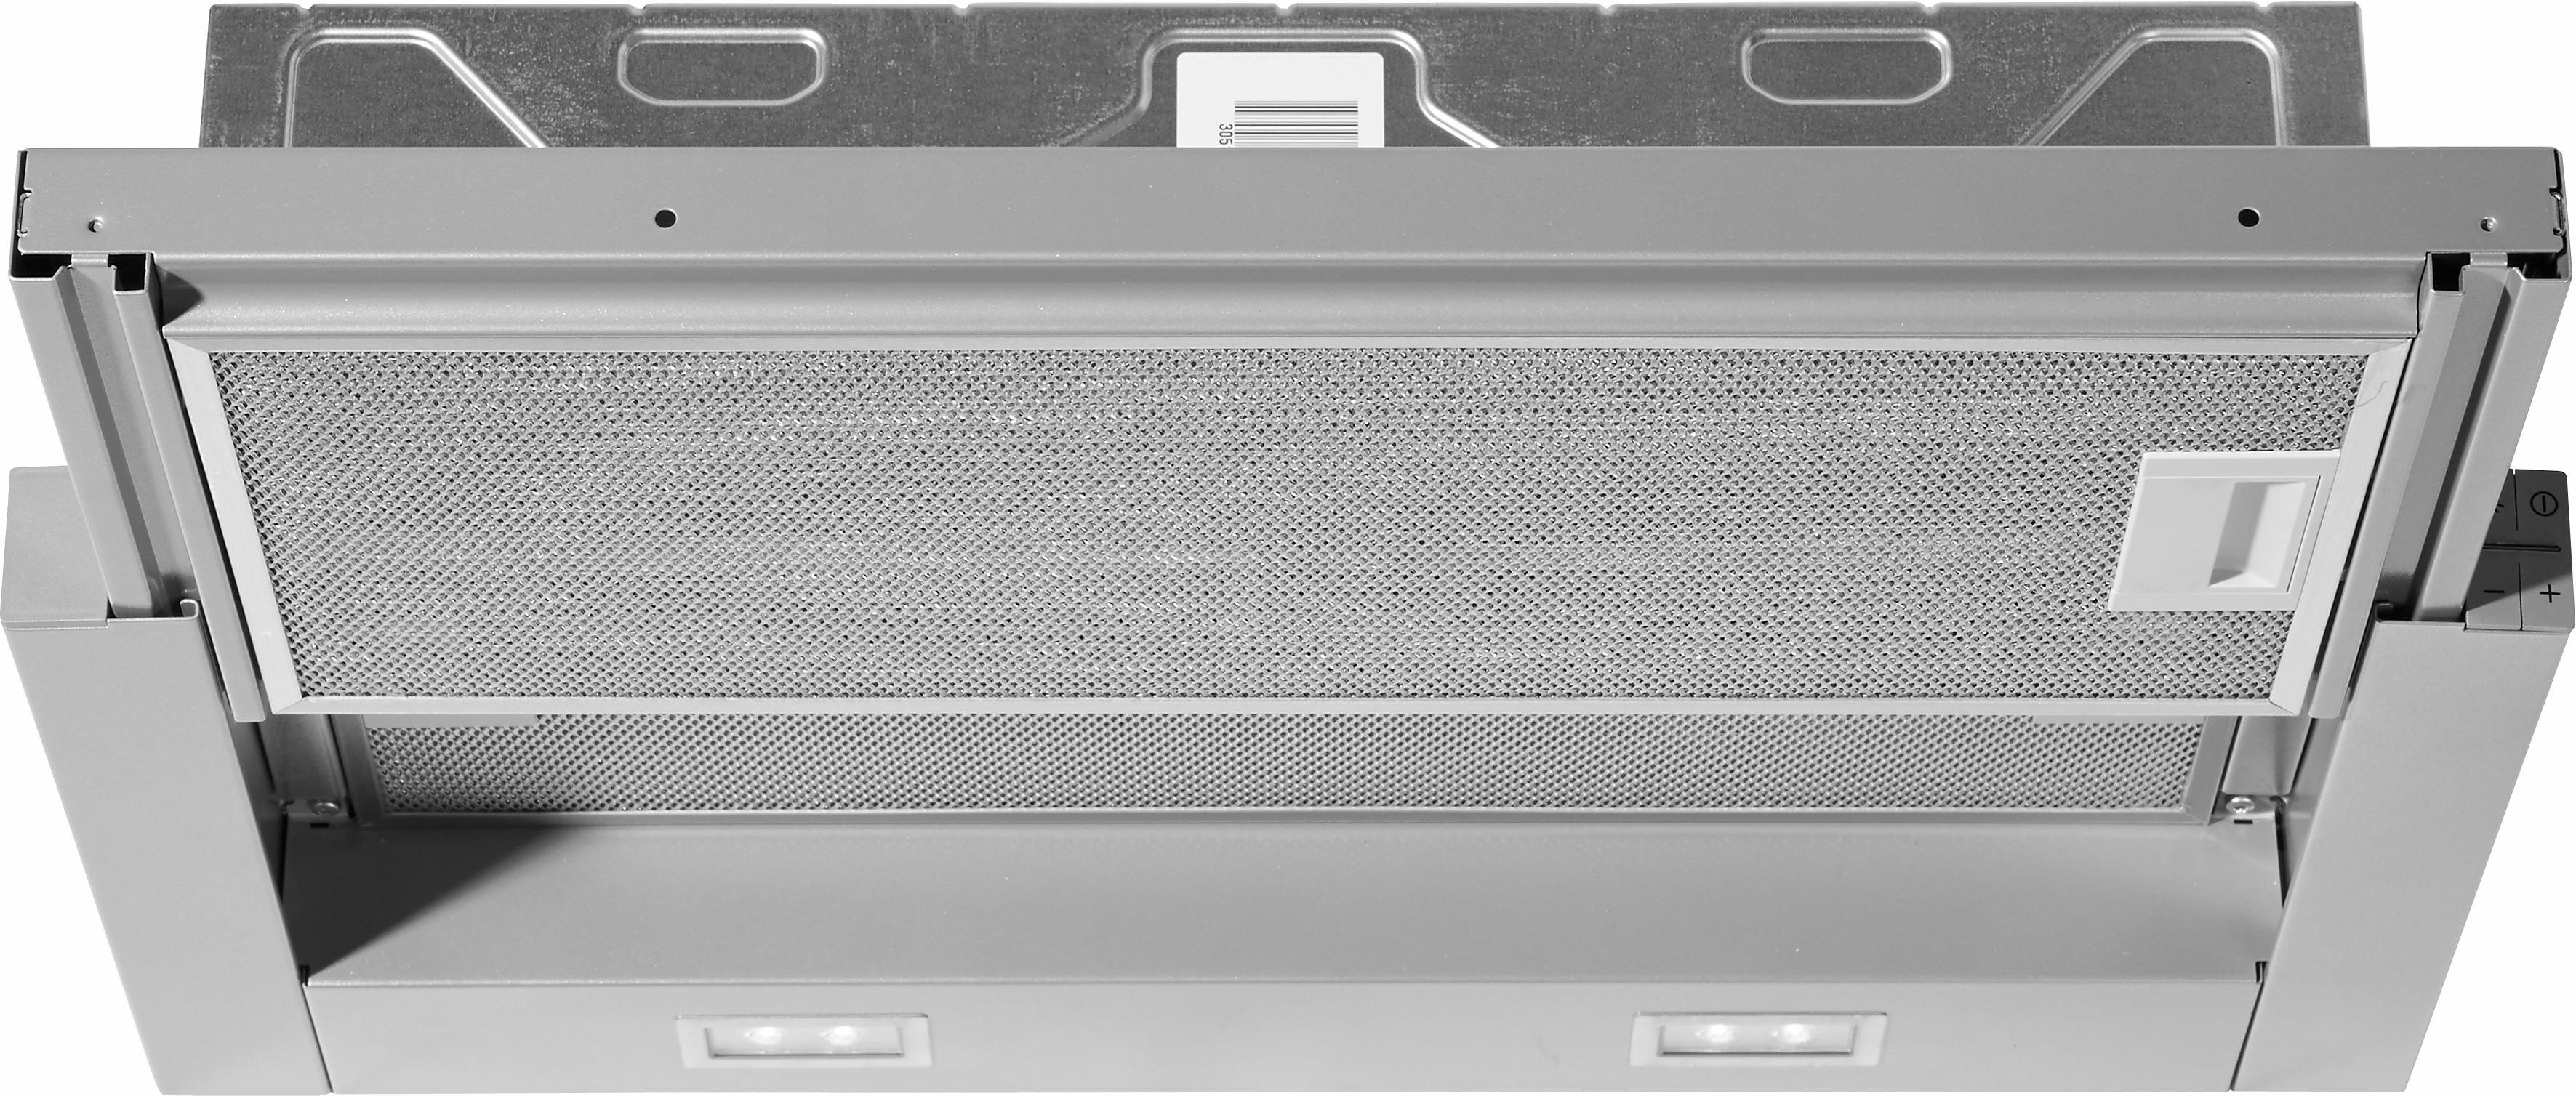 "Siemens Flachschirmhaube iQ300 ""LI64LA530"", A"